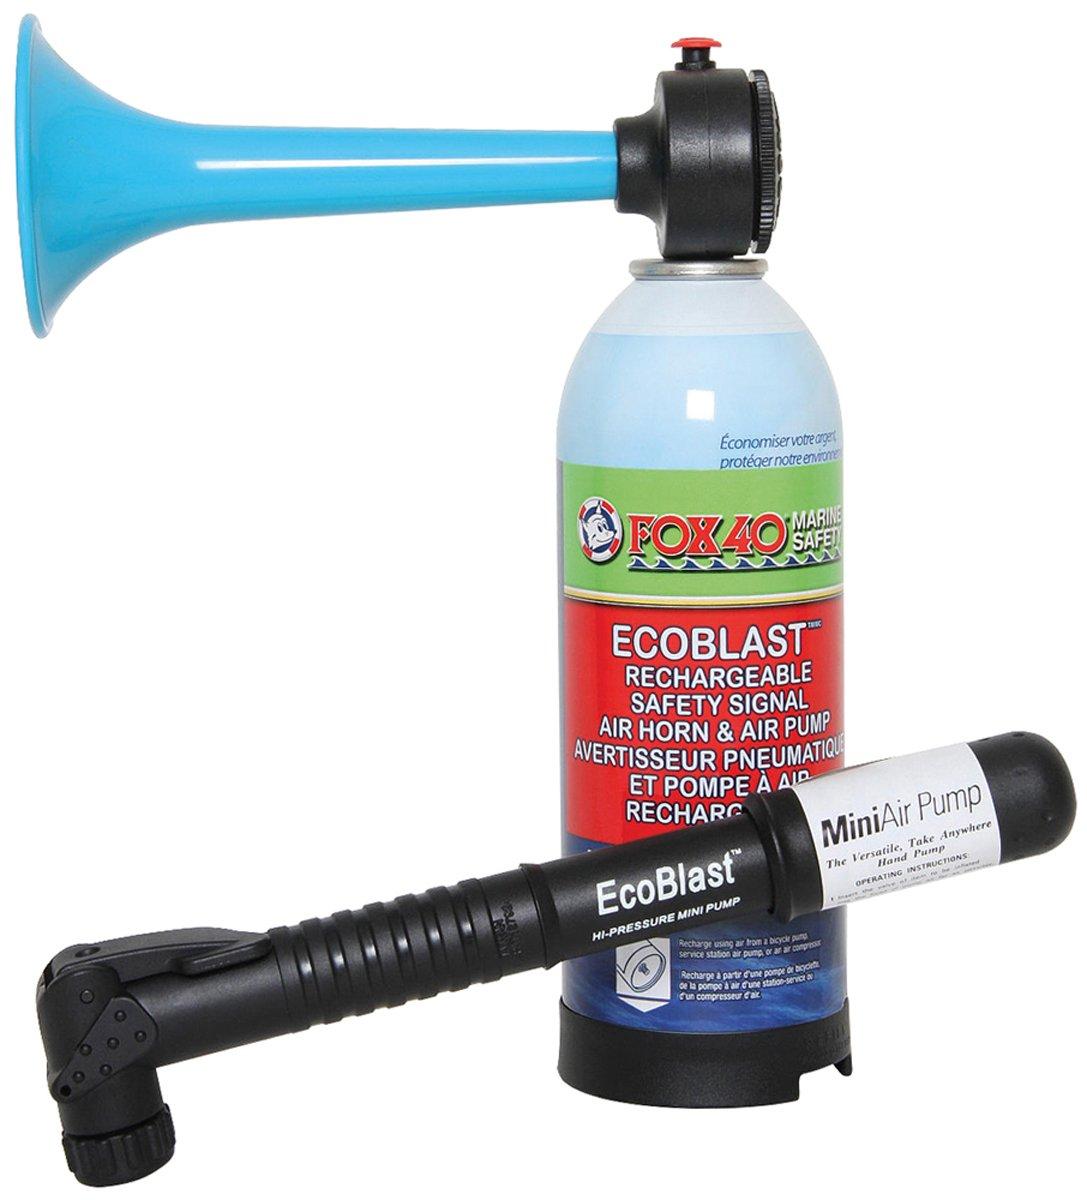 Fox 40 Sports Safety Hand Held Horn High Pressure Ecoblast Air Horn + Mini Pump